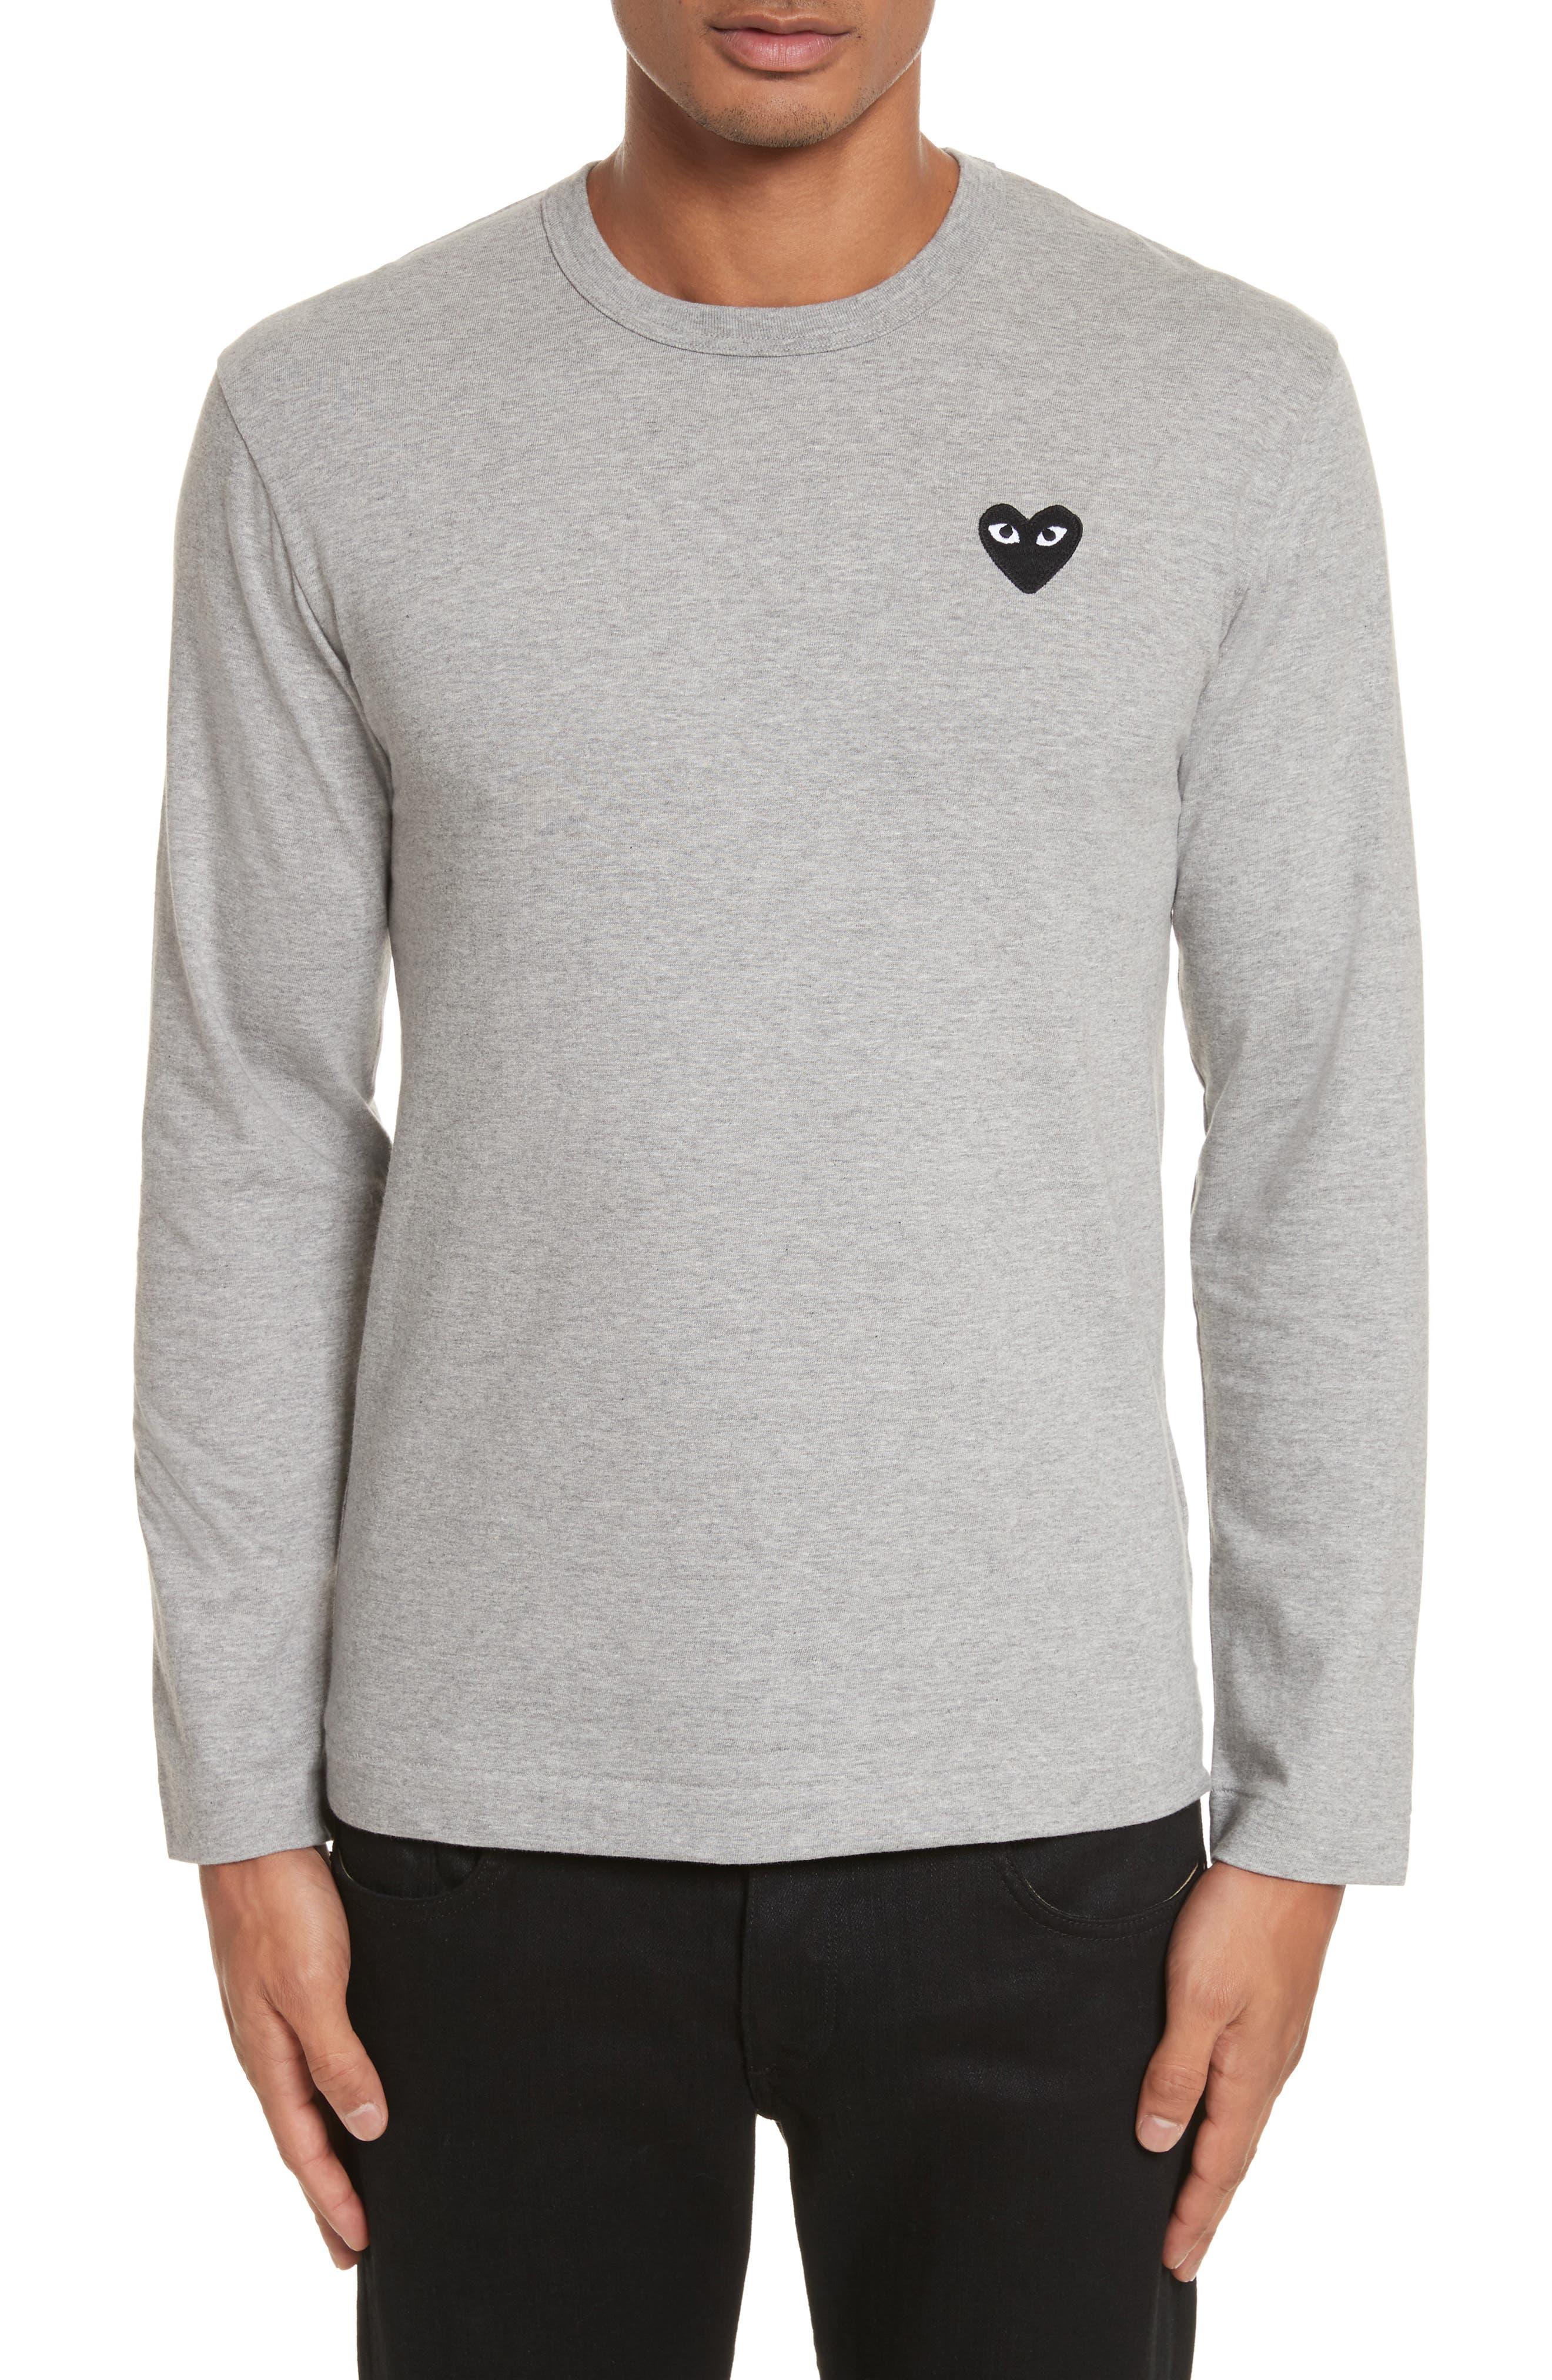 PLAY Long Sleeve T-Shirt,                         Main,                         color, Grey